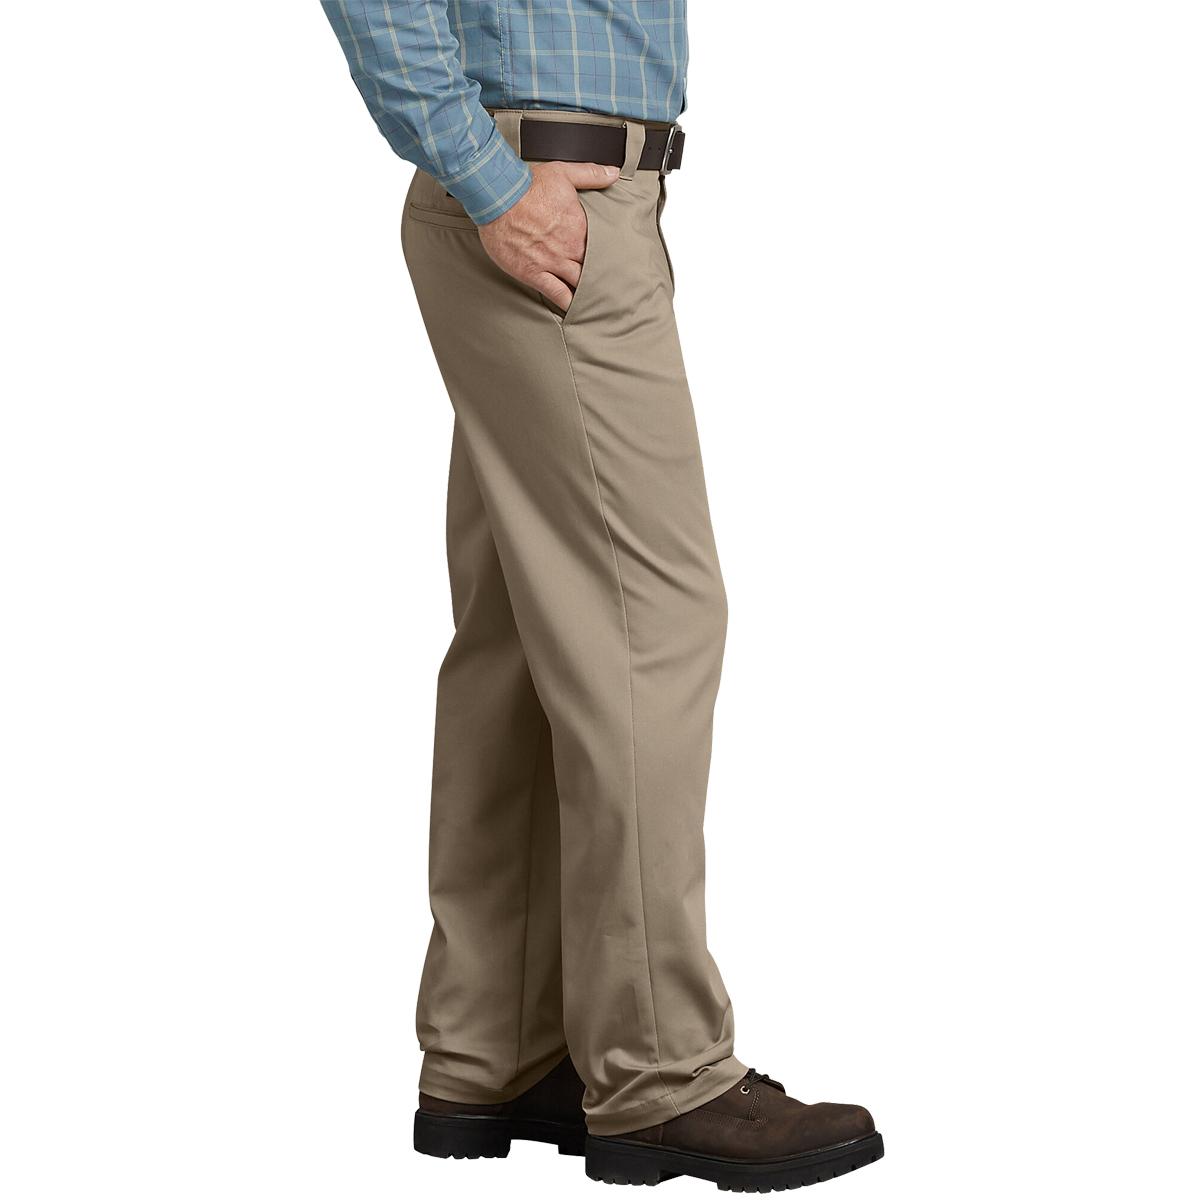 thumbnail 6 - Dickies FLEX Tough Max Regular Fit Straight Leg Twill Work Pants Desert Khaki